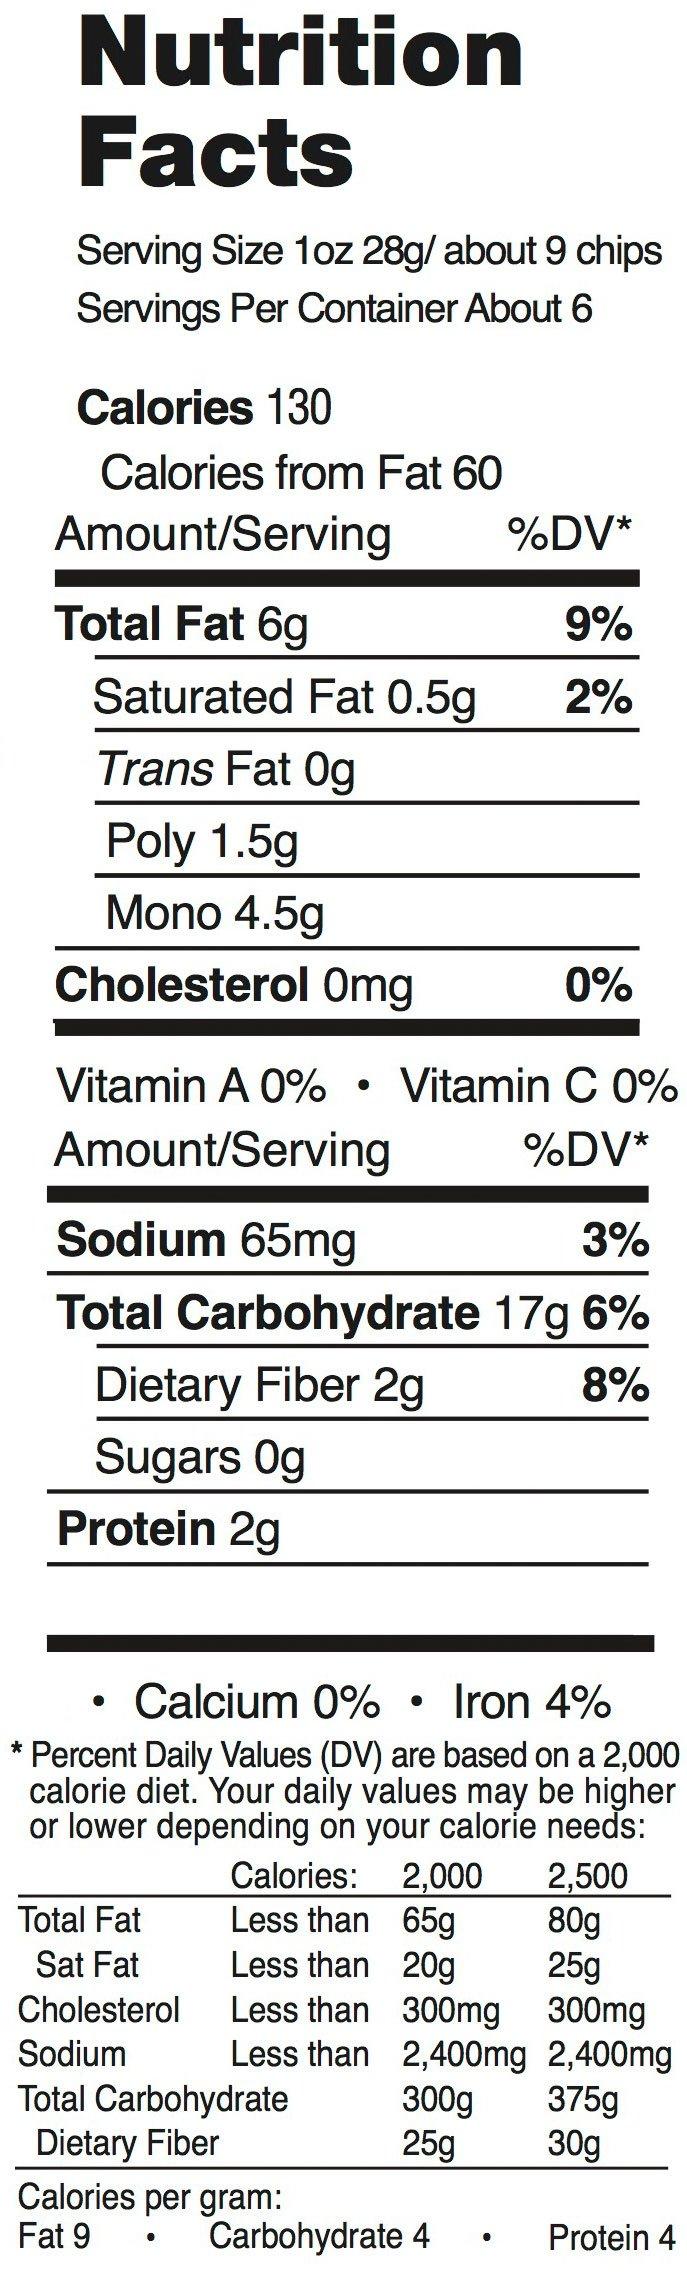 LATE JULY SNACKS Organic Multigrain Sea Salt Tortilla Chips 1.5 oz - Pack of 24